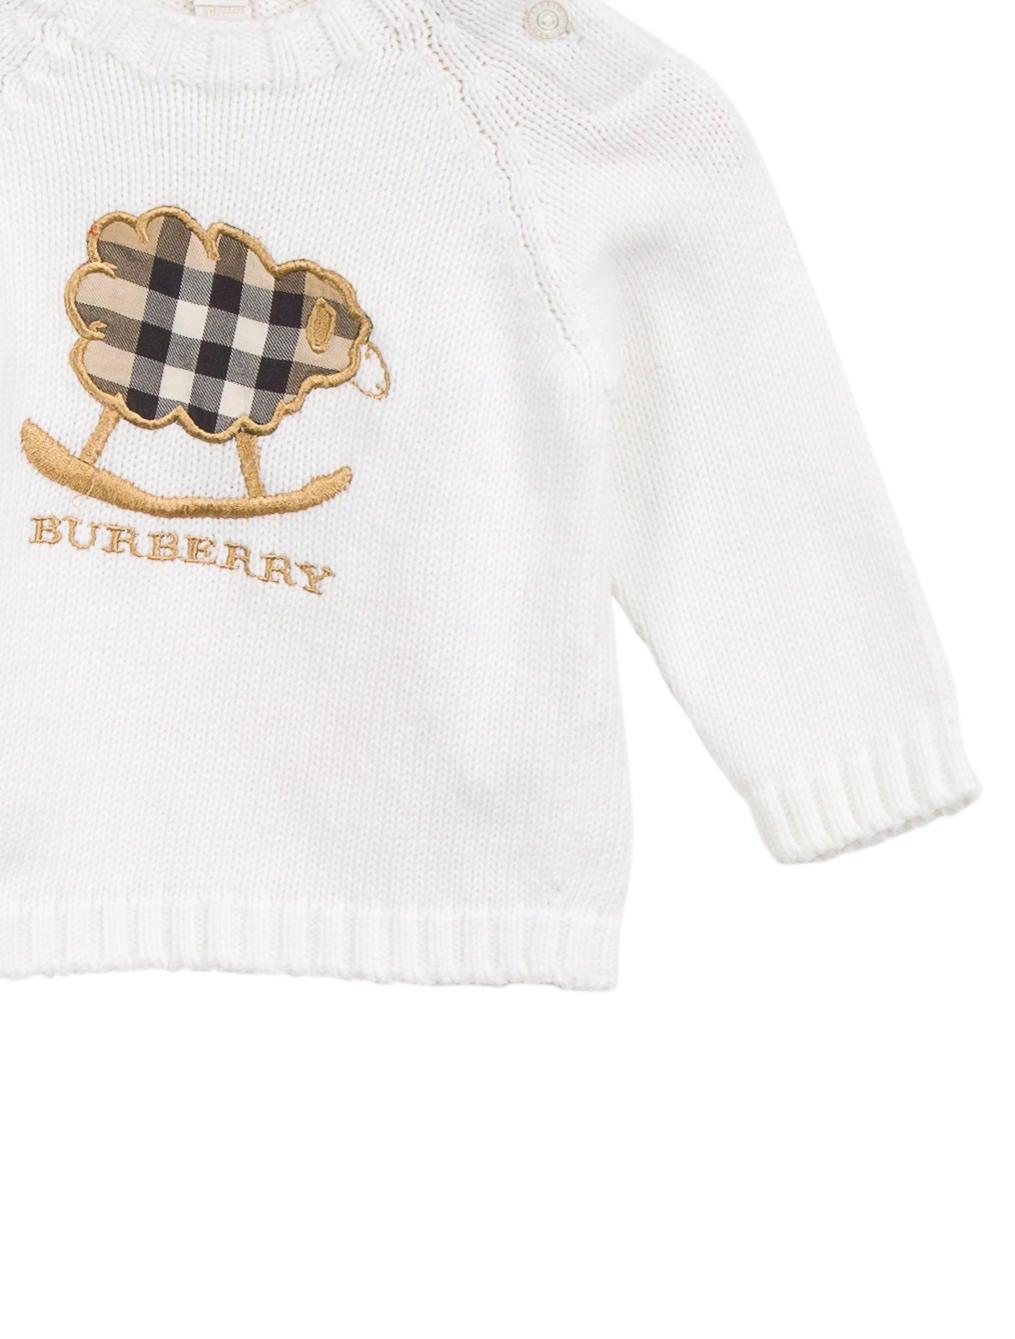 Burberry Boys Nova Check Logo Sweater Boys BUR80130  : BUR801303enlarged from www.therealreal.com size 1015 x 1339 jpeg 100kB